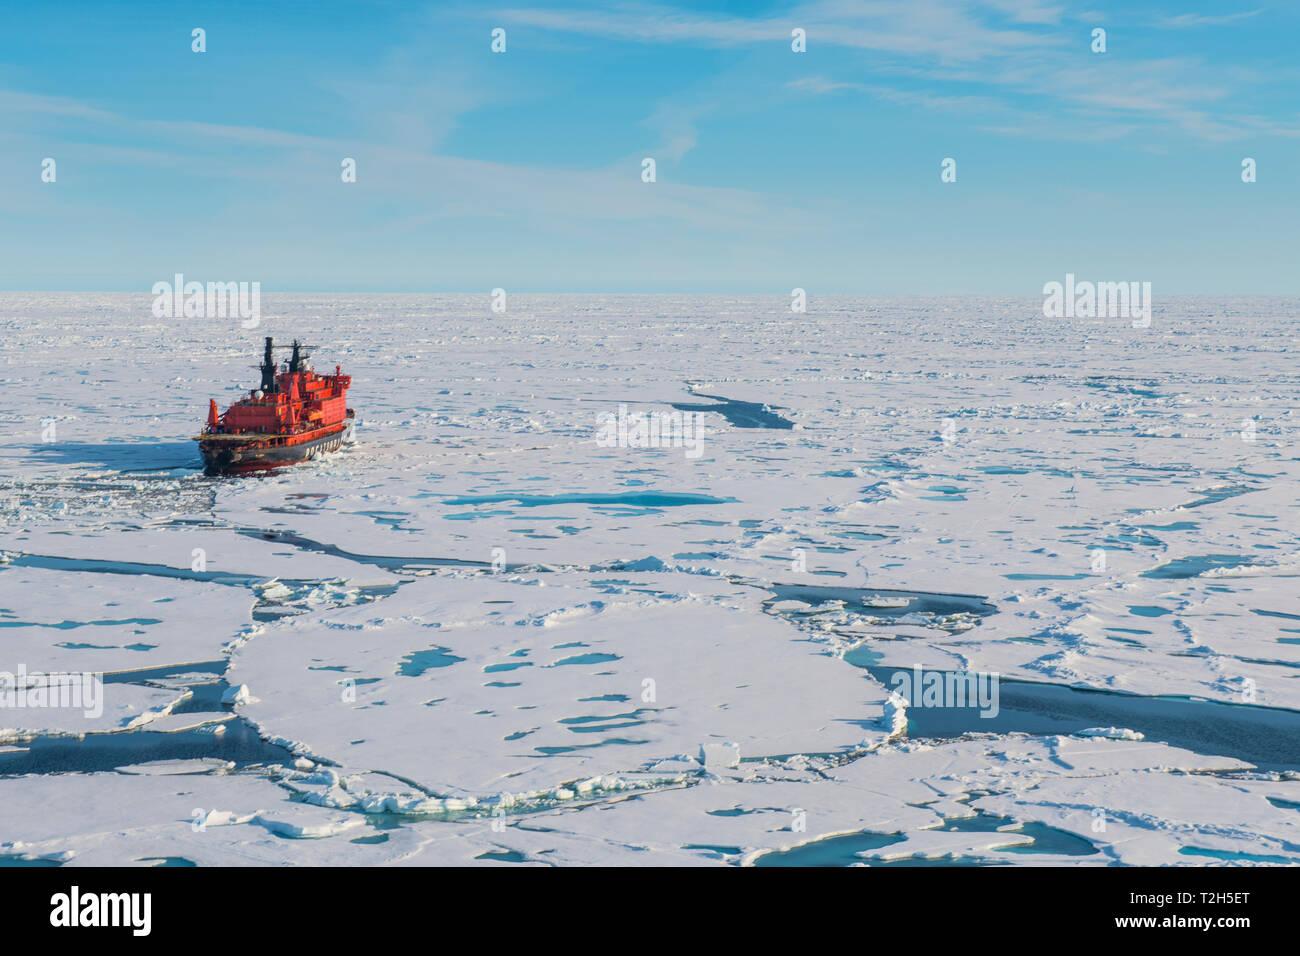 43b33b2ef5 Ice Ice Breaker Stock Photos & Ice Ice Breaker Stock Images - Alamy